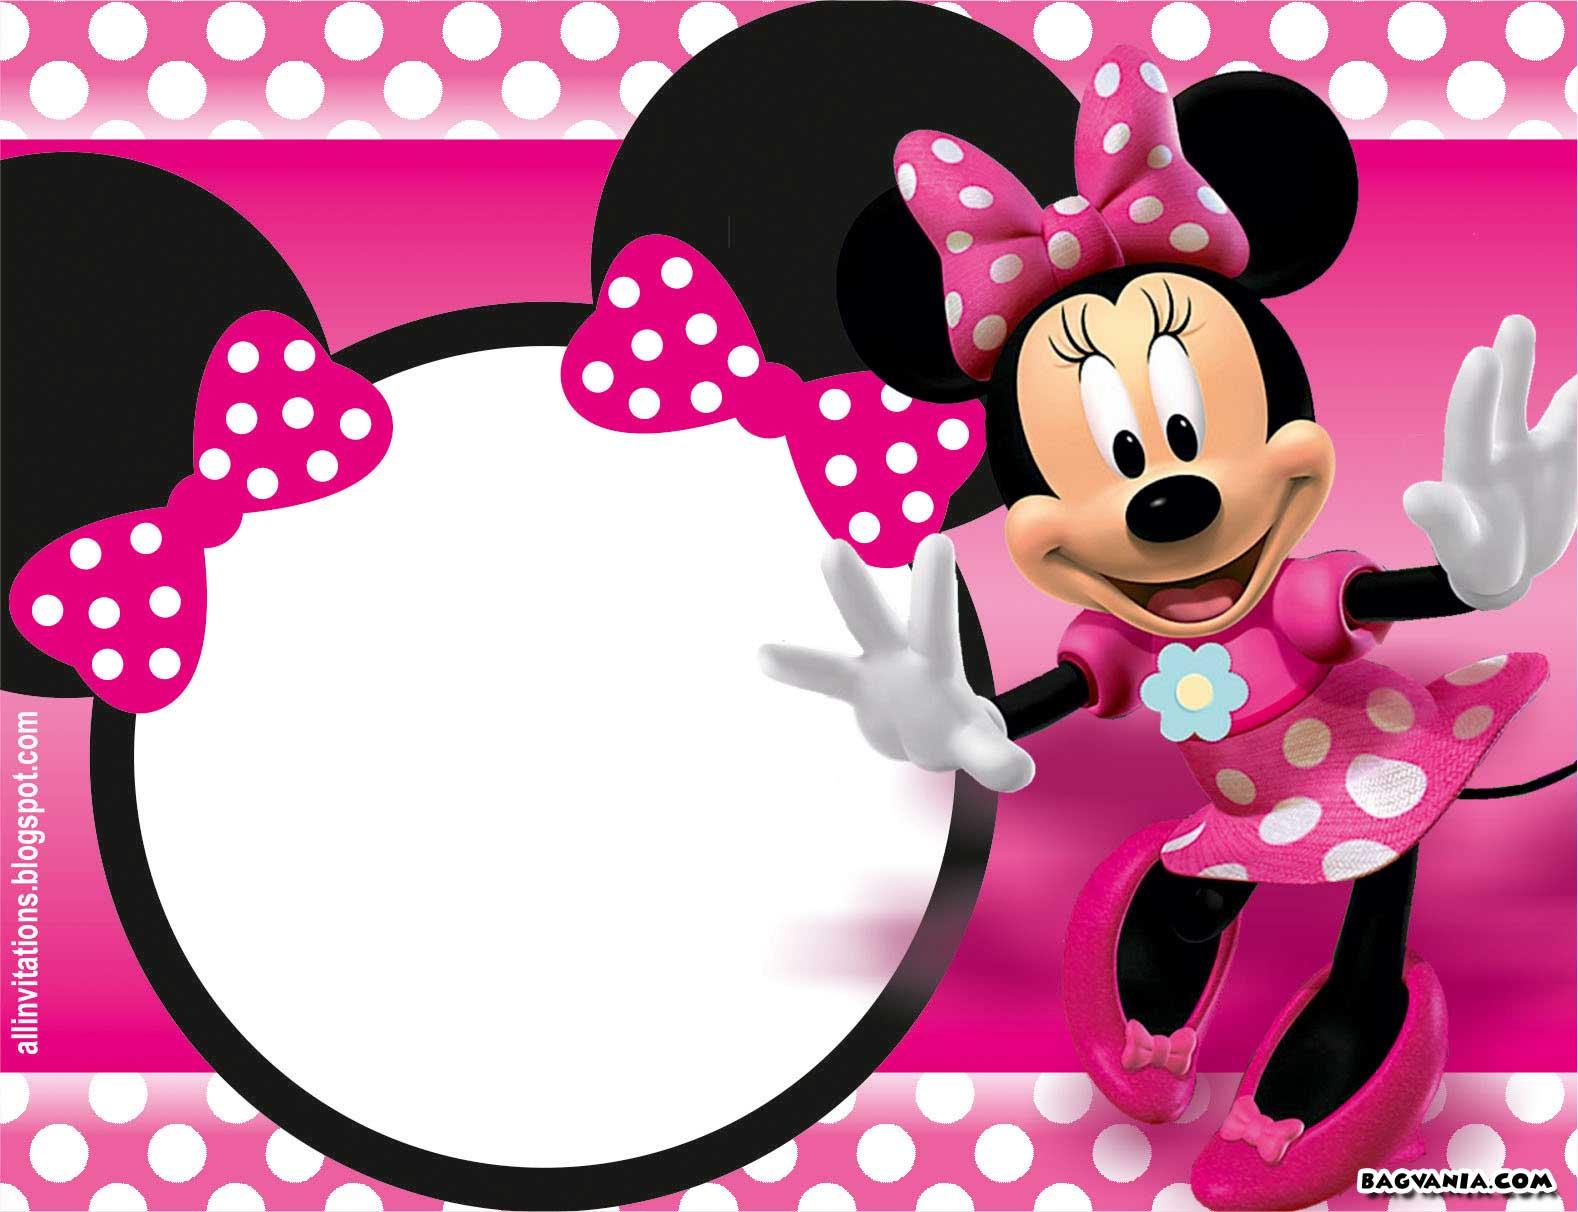 Free Printable Minnie Mouse Birthday Invitations Free Printable Birthday Invitation Templates Bagvania